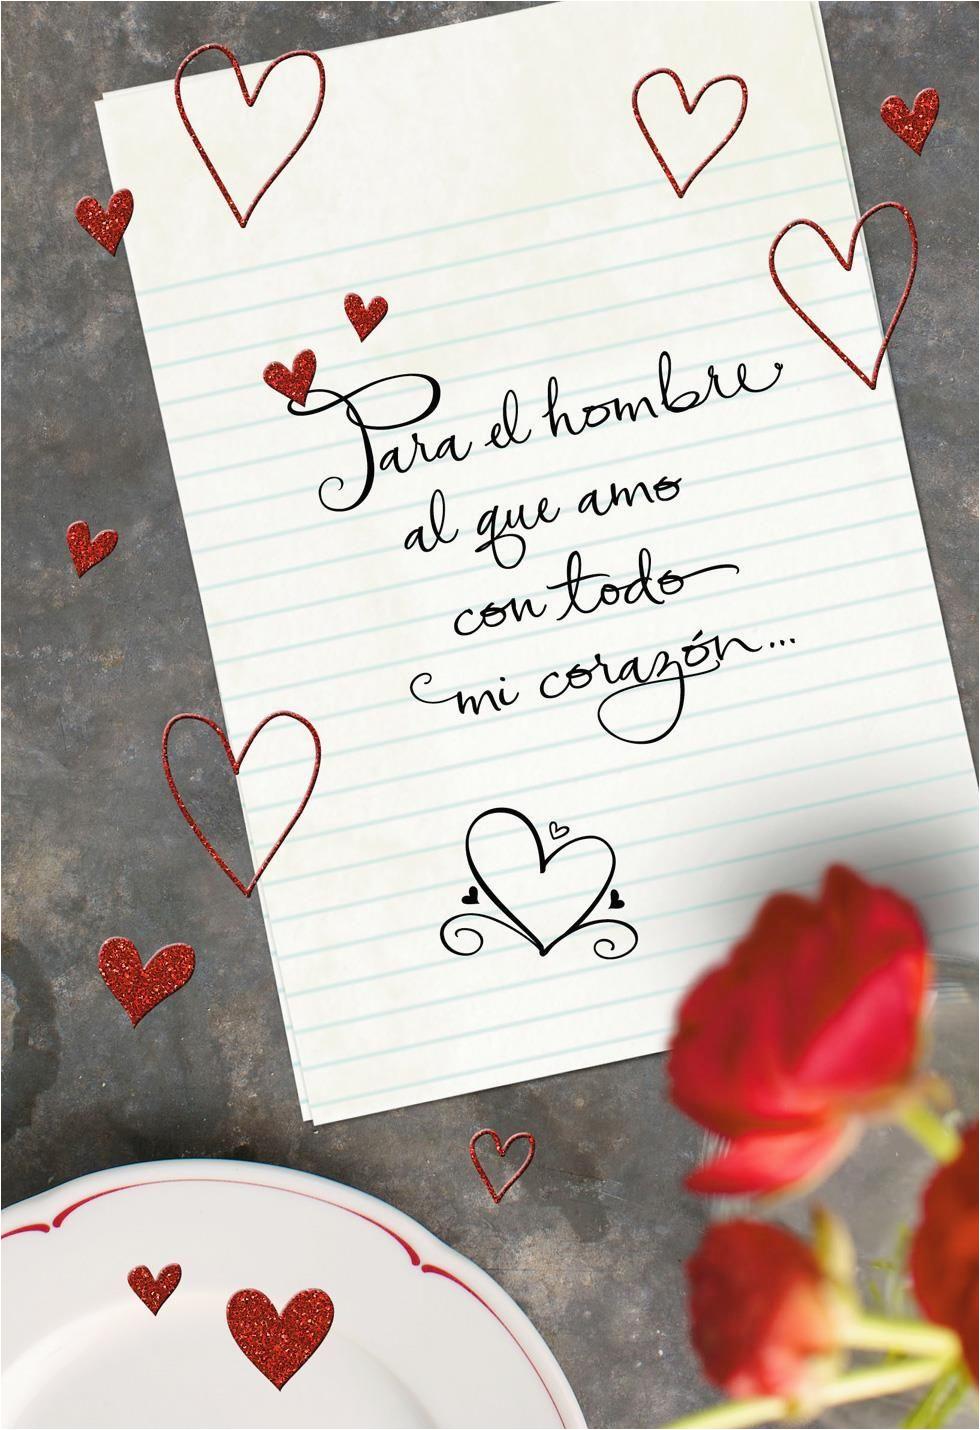 Hallmark Romantic Birthday Cards For Him To The Man I Love Spanish Language Valentine 39